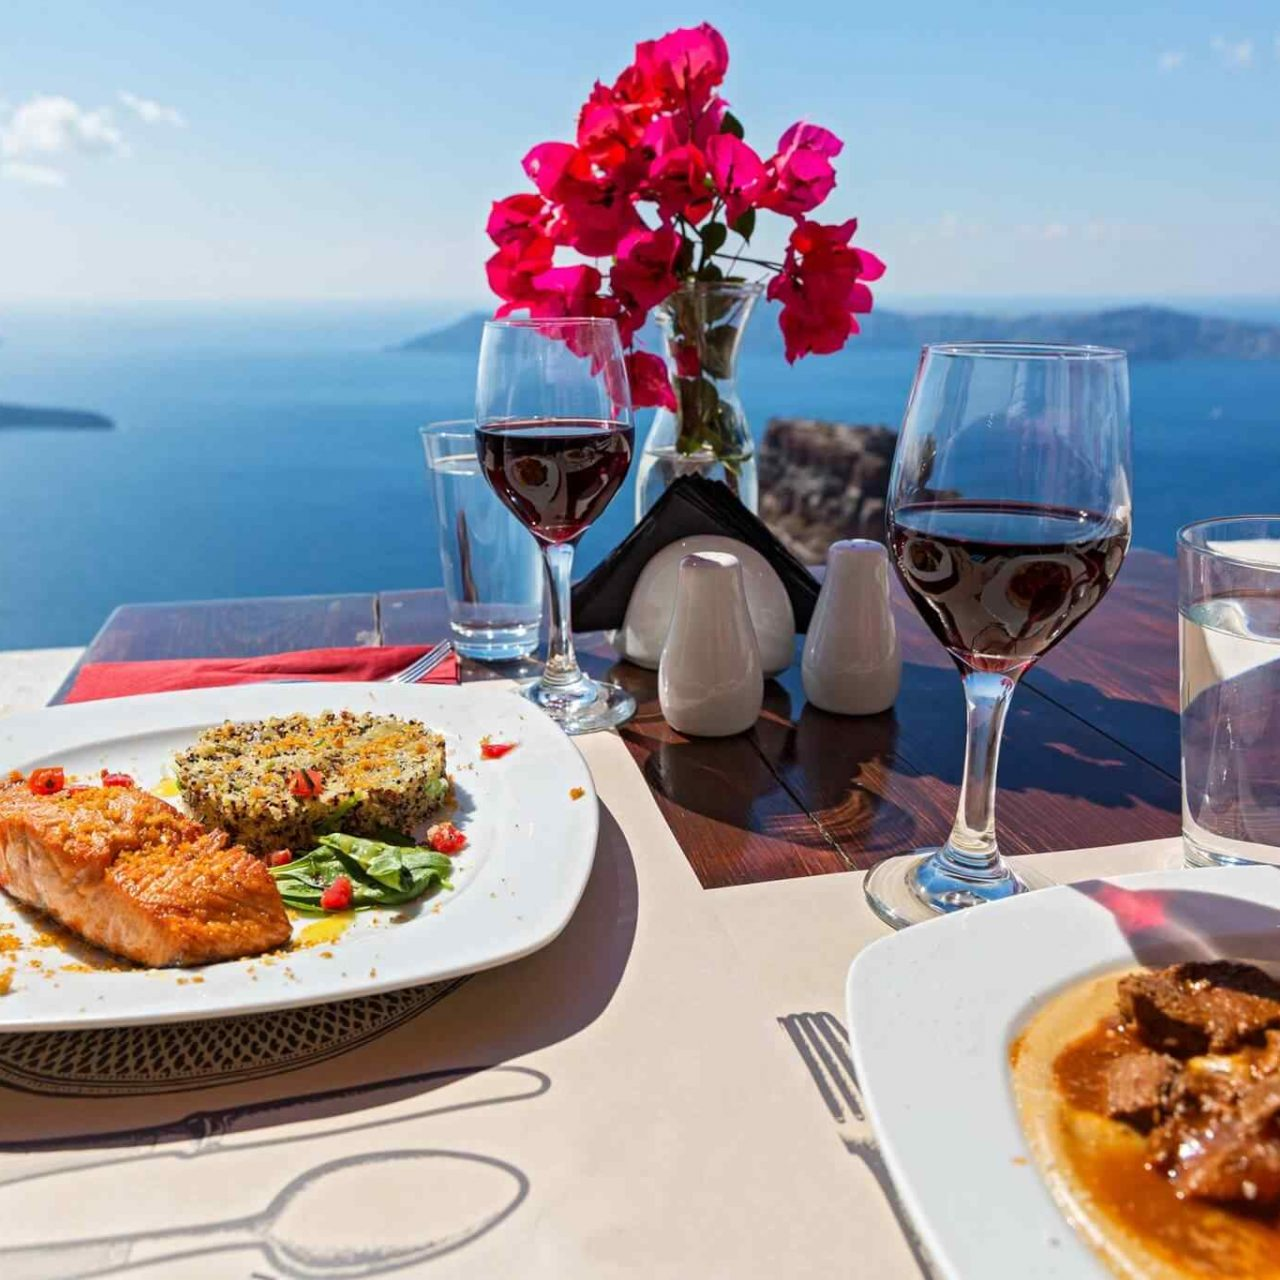 https://theglam.es/wp-content/uploads/2017/10/restaurant-italian-25-1280x1280.jpg